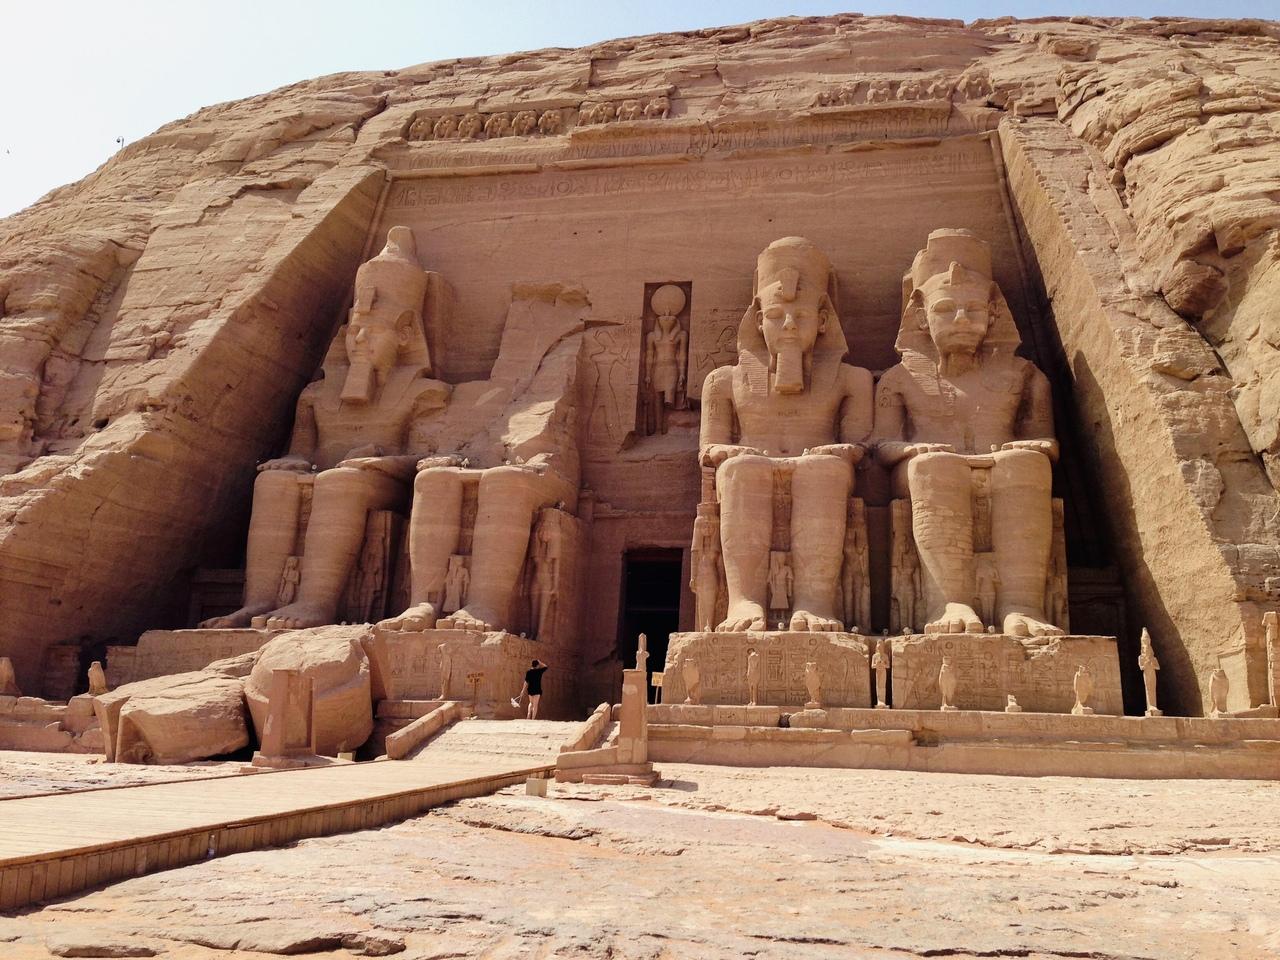 Великий Храм Рамсеса II, Абу-Симбел, Египет